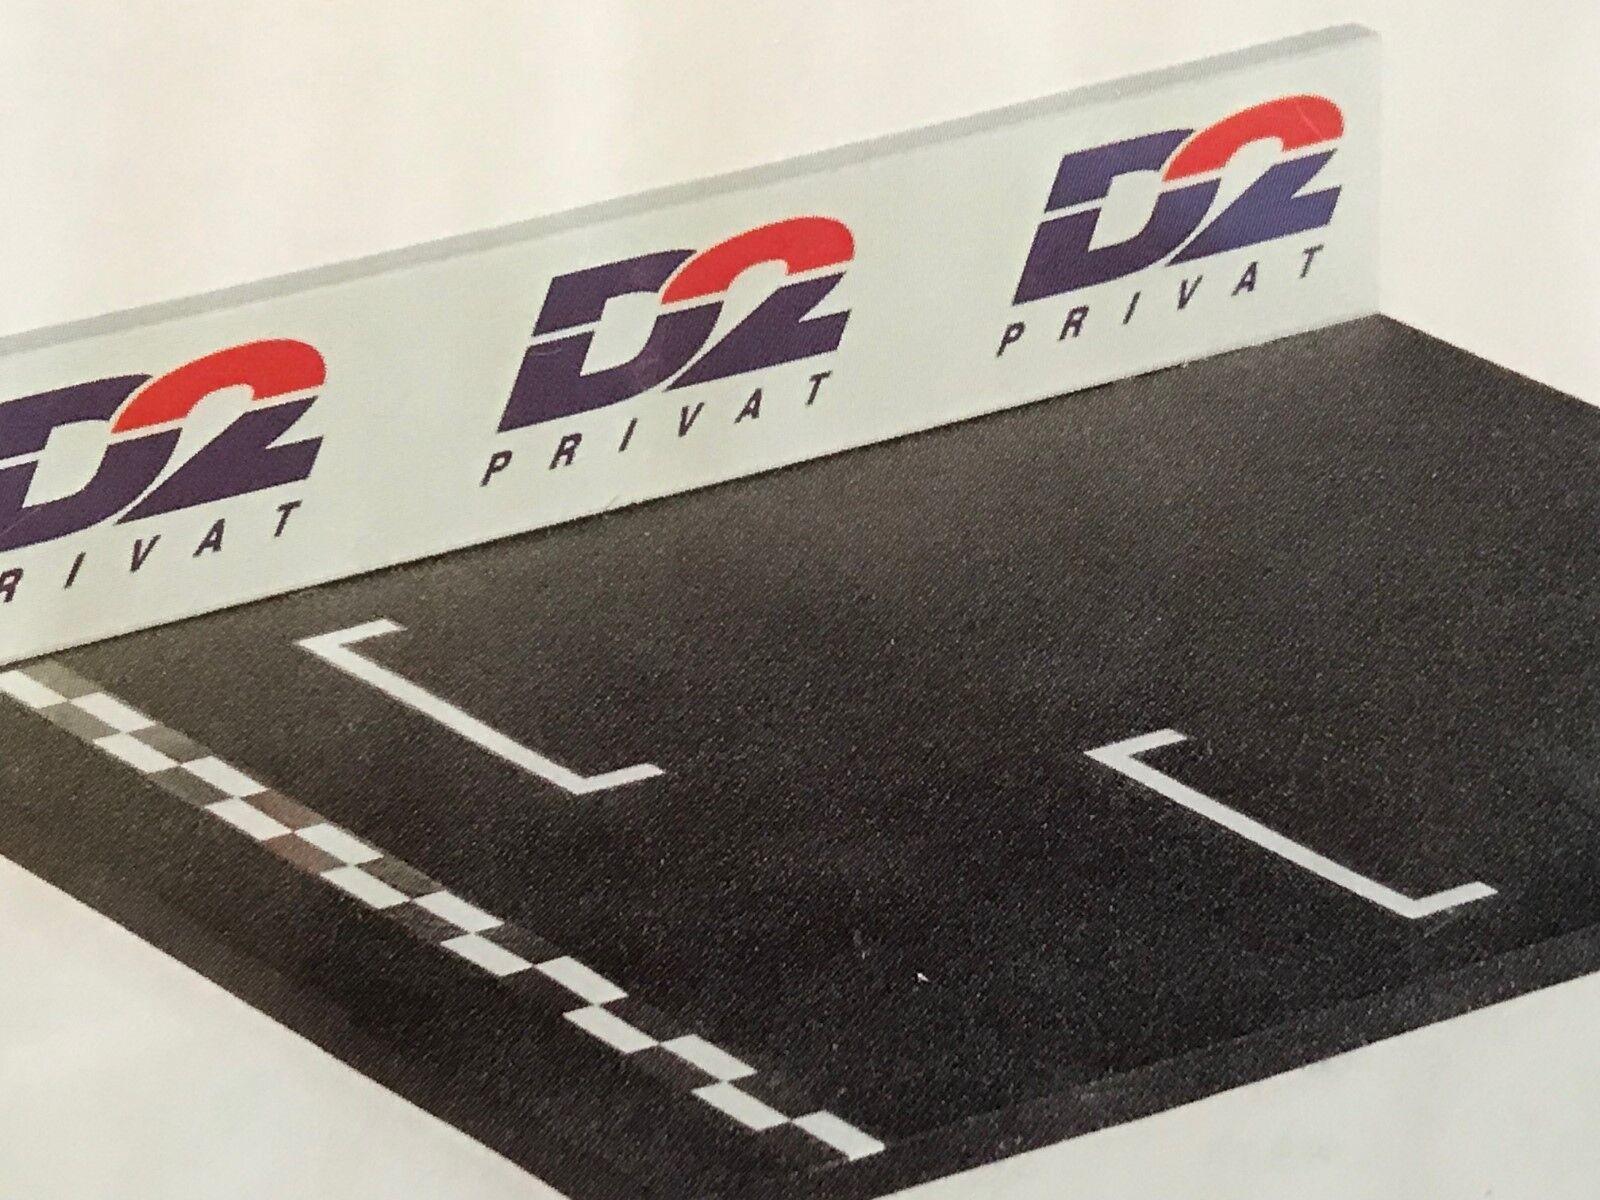 Exoto 43 Hi-Tech   DTM Racing Pole Postion Diorama   D2 Privat     EHT43260